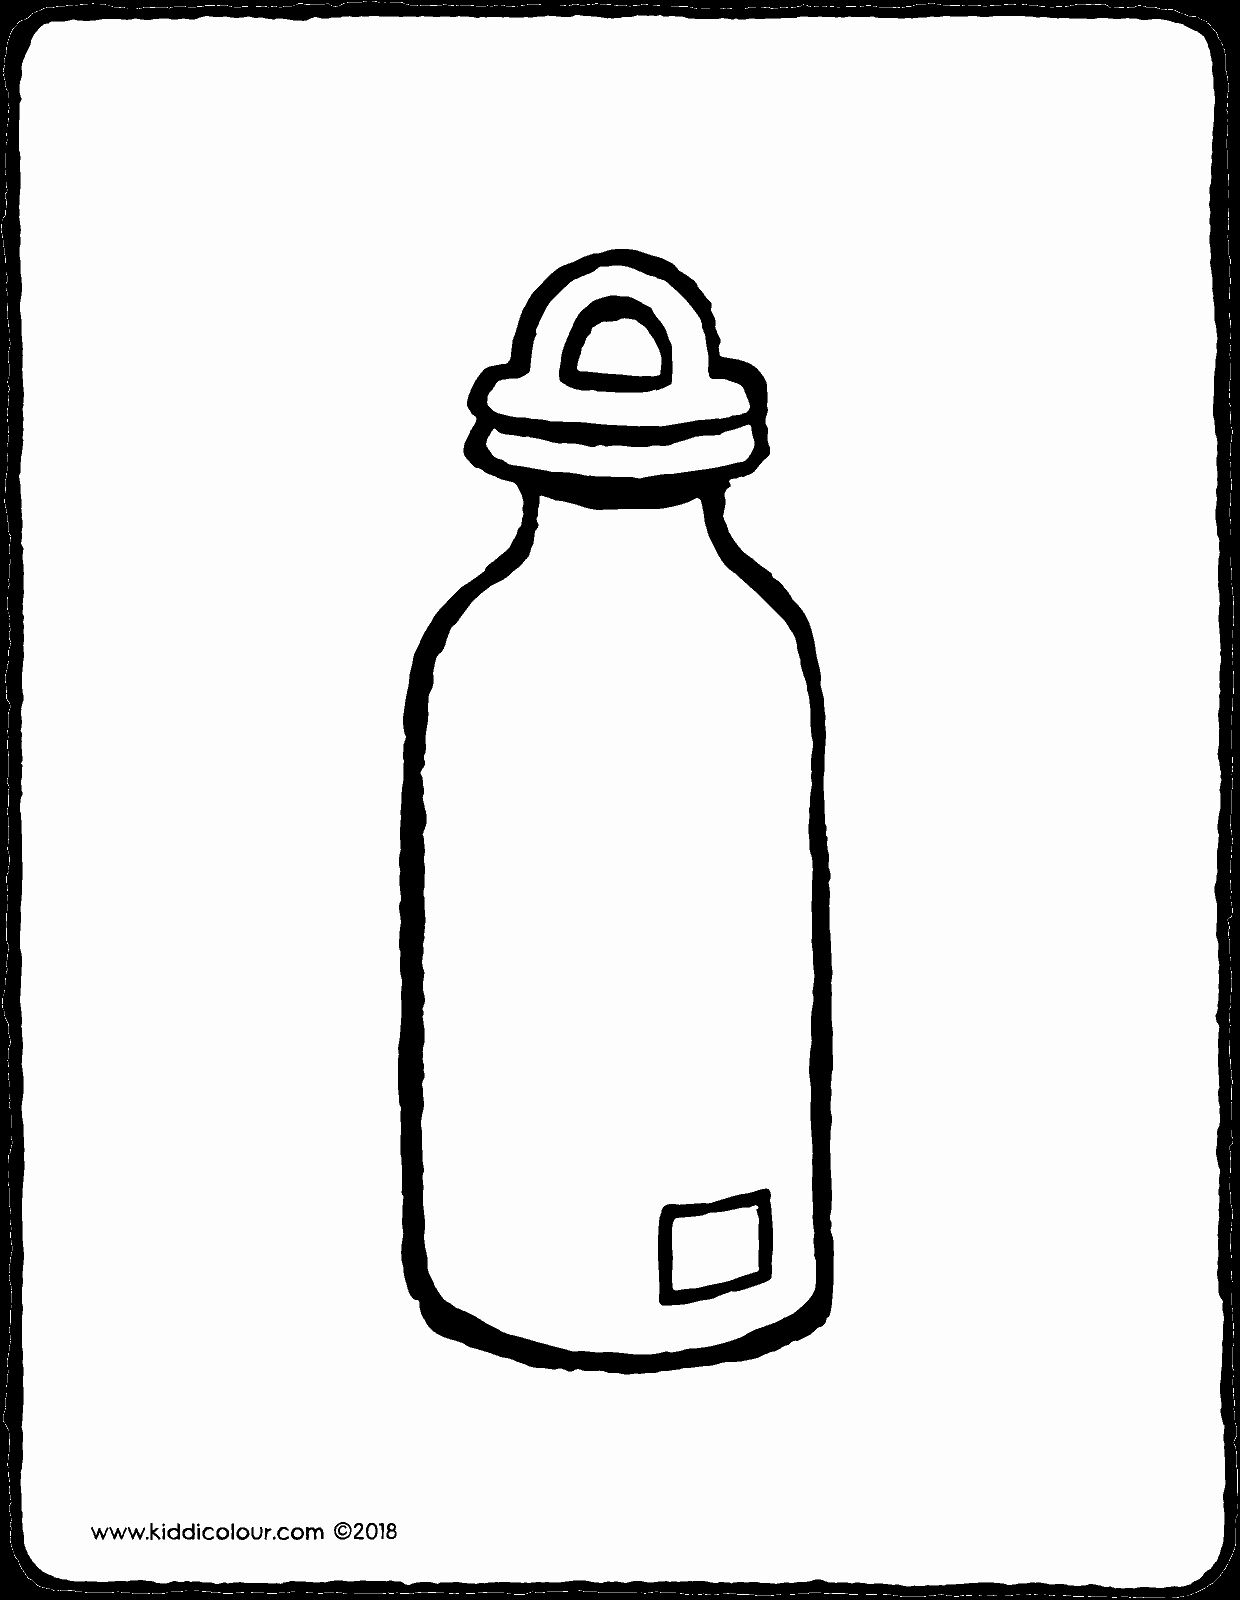 Water Bottle Coloring Page Lovely Water Bottle Kiddicolour In 2020